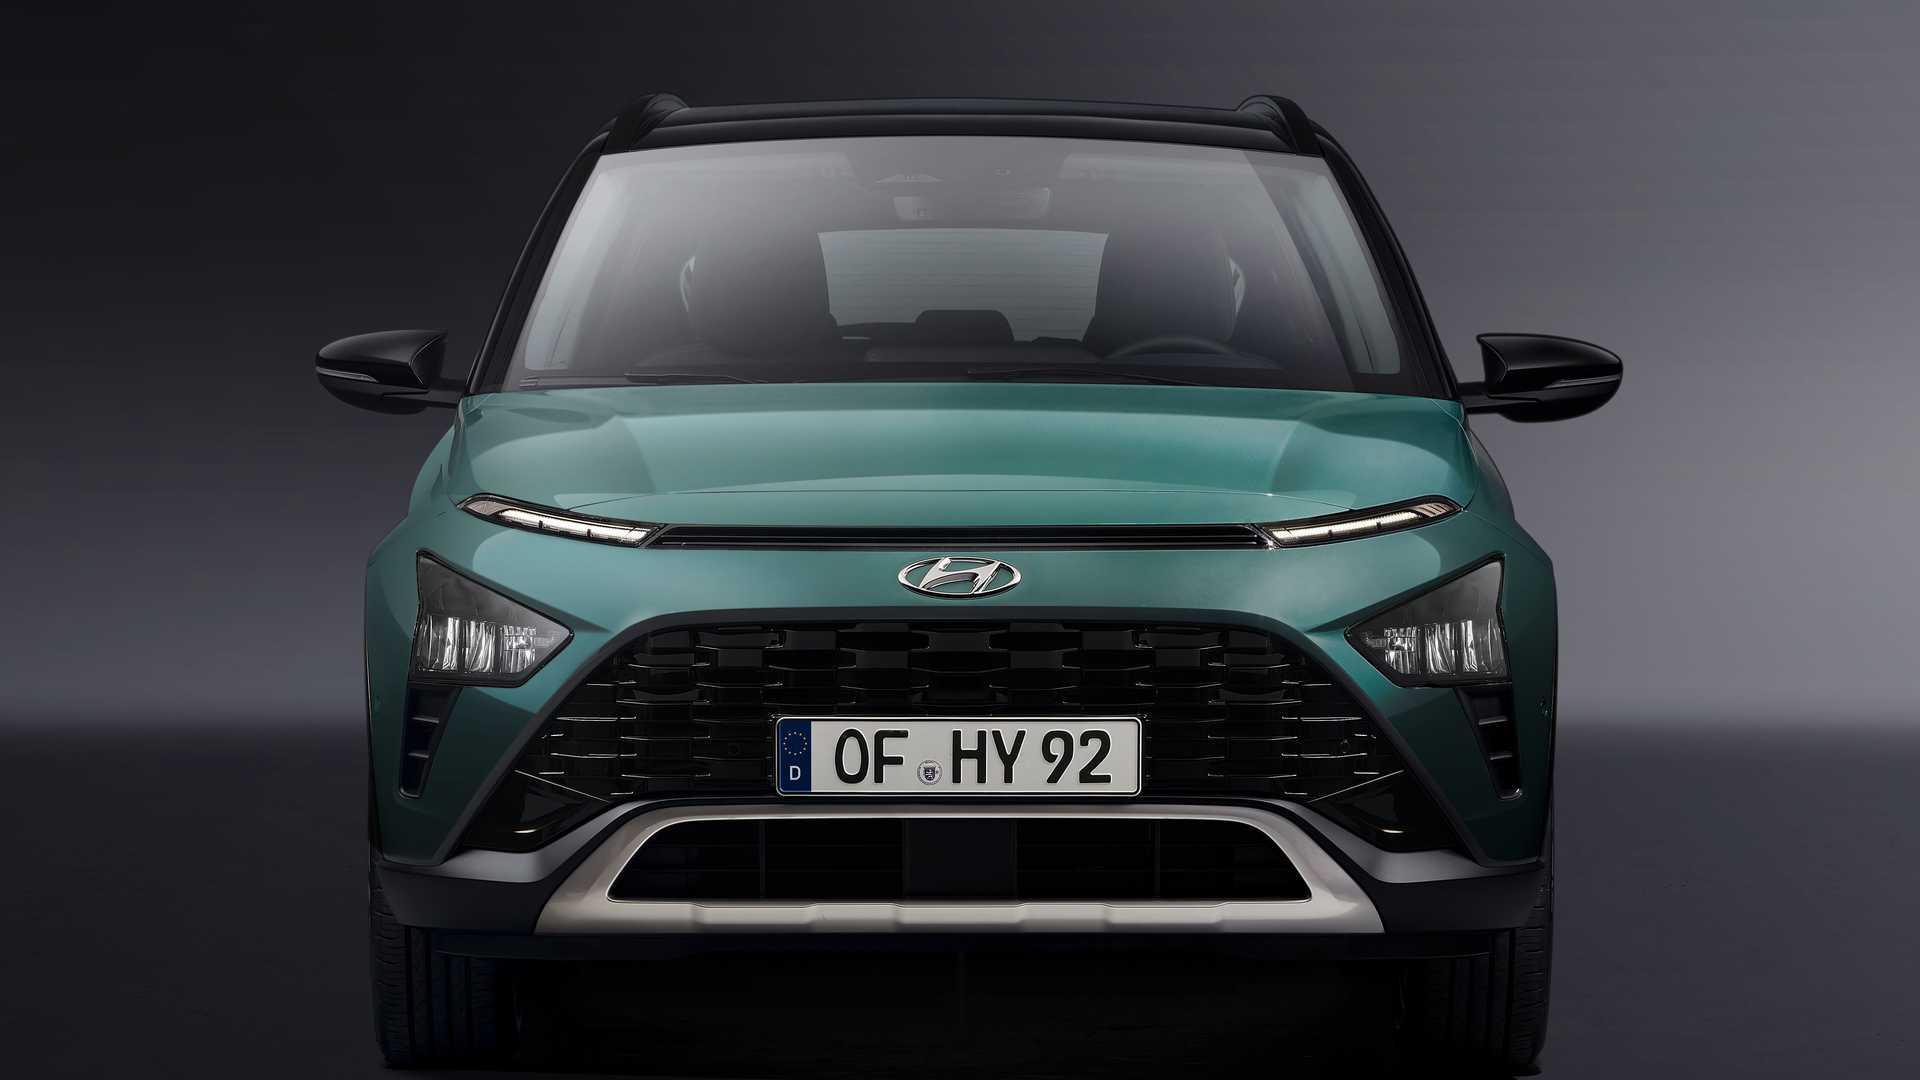 Hyundai Bayon crossover